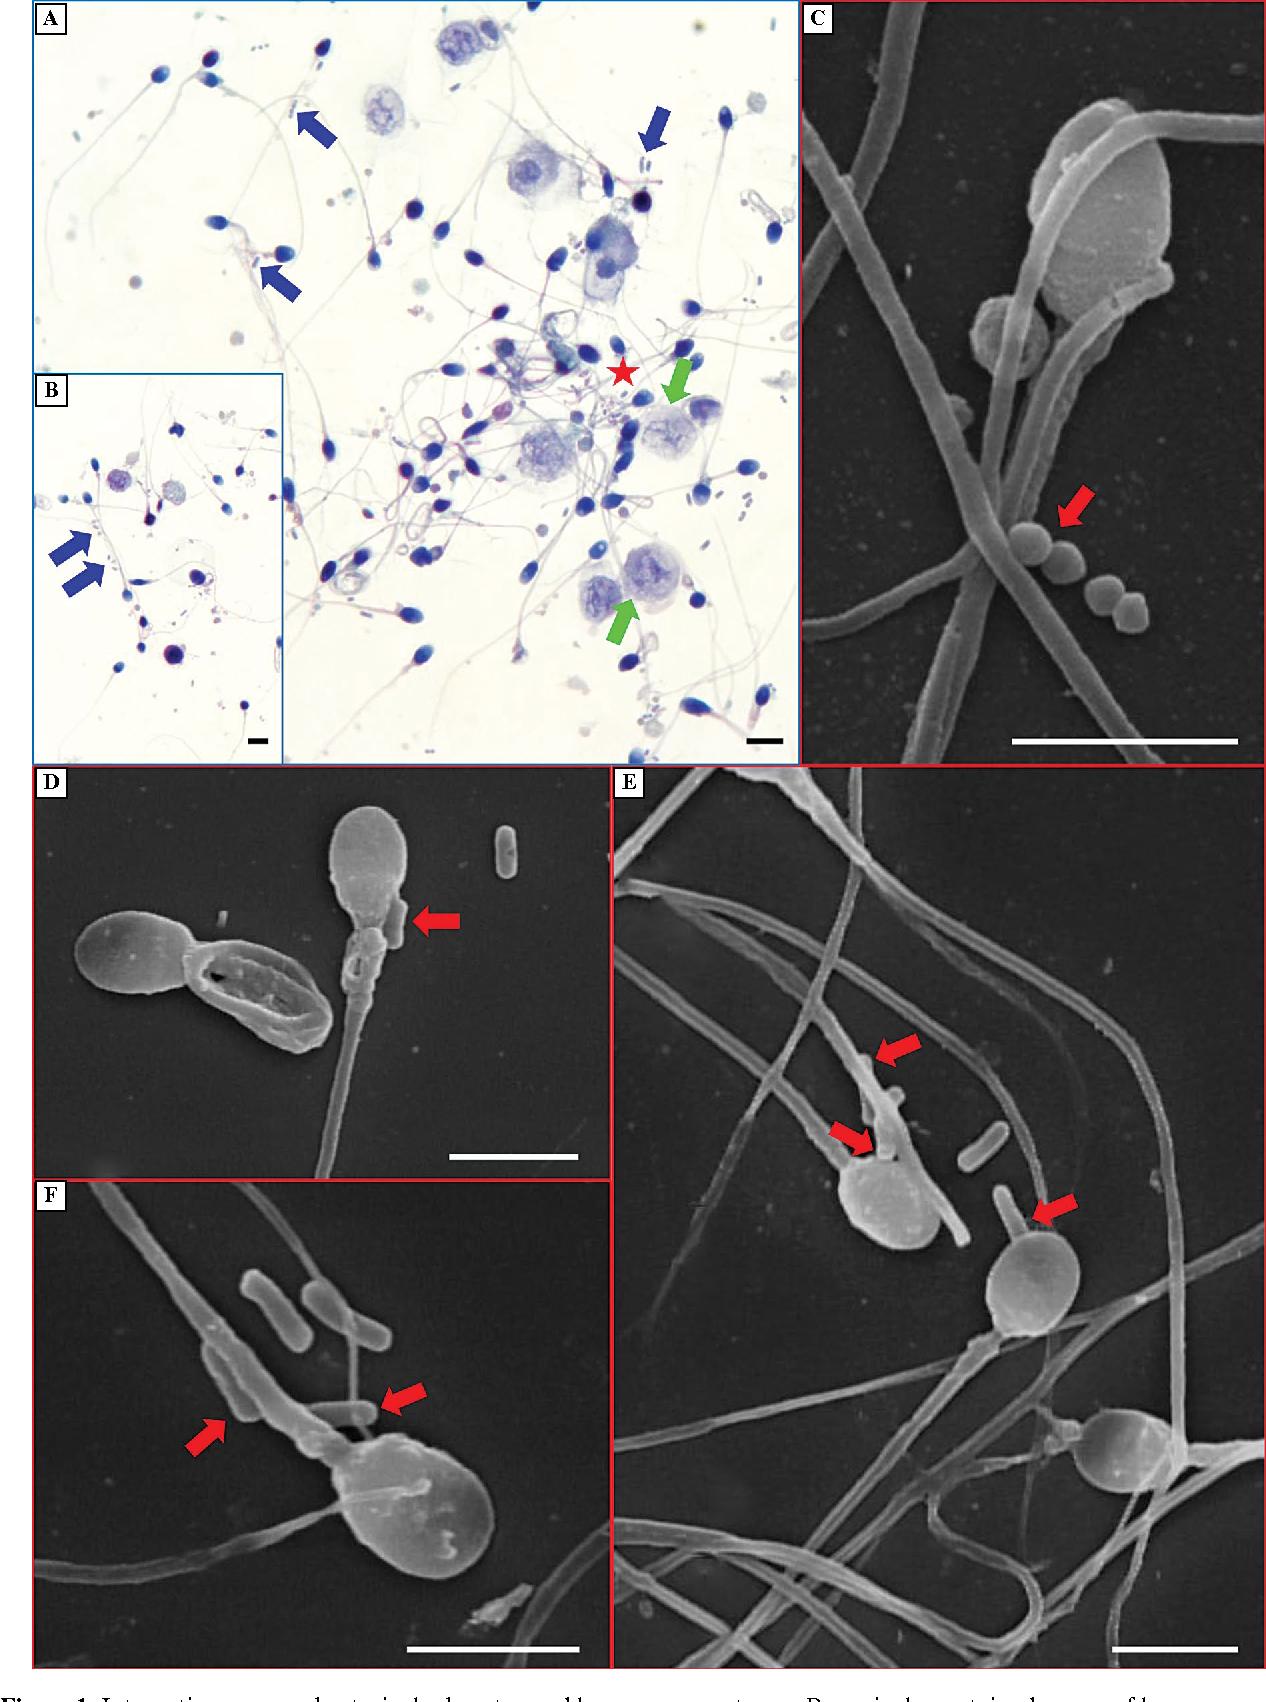 Bacteria coli sperm #2